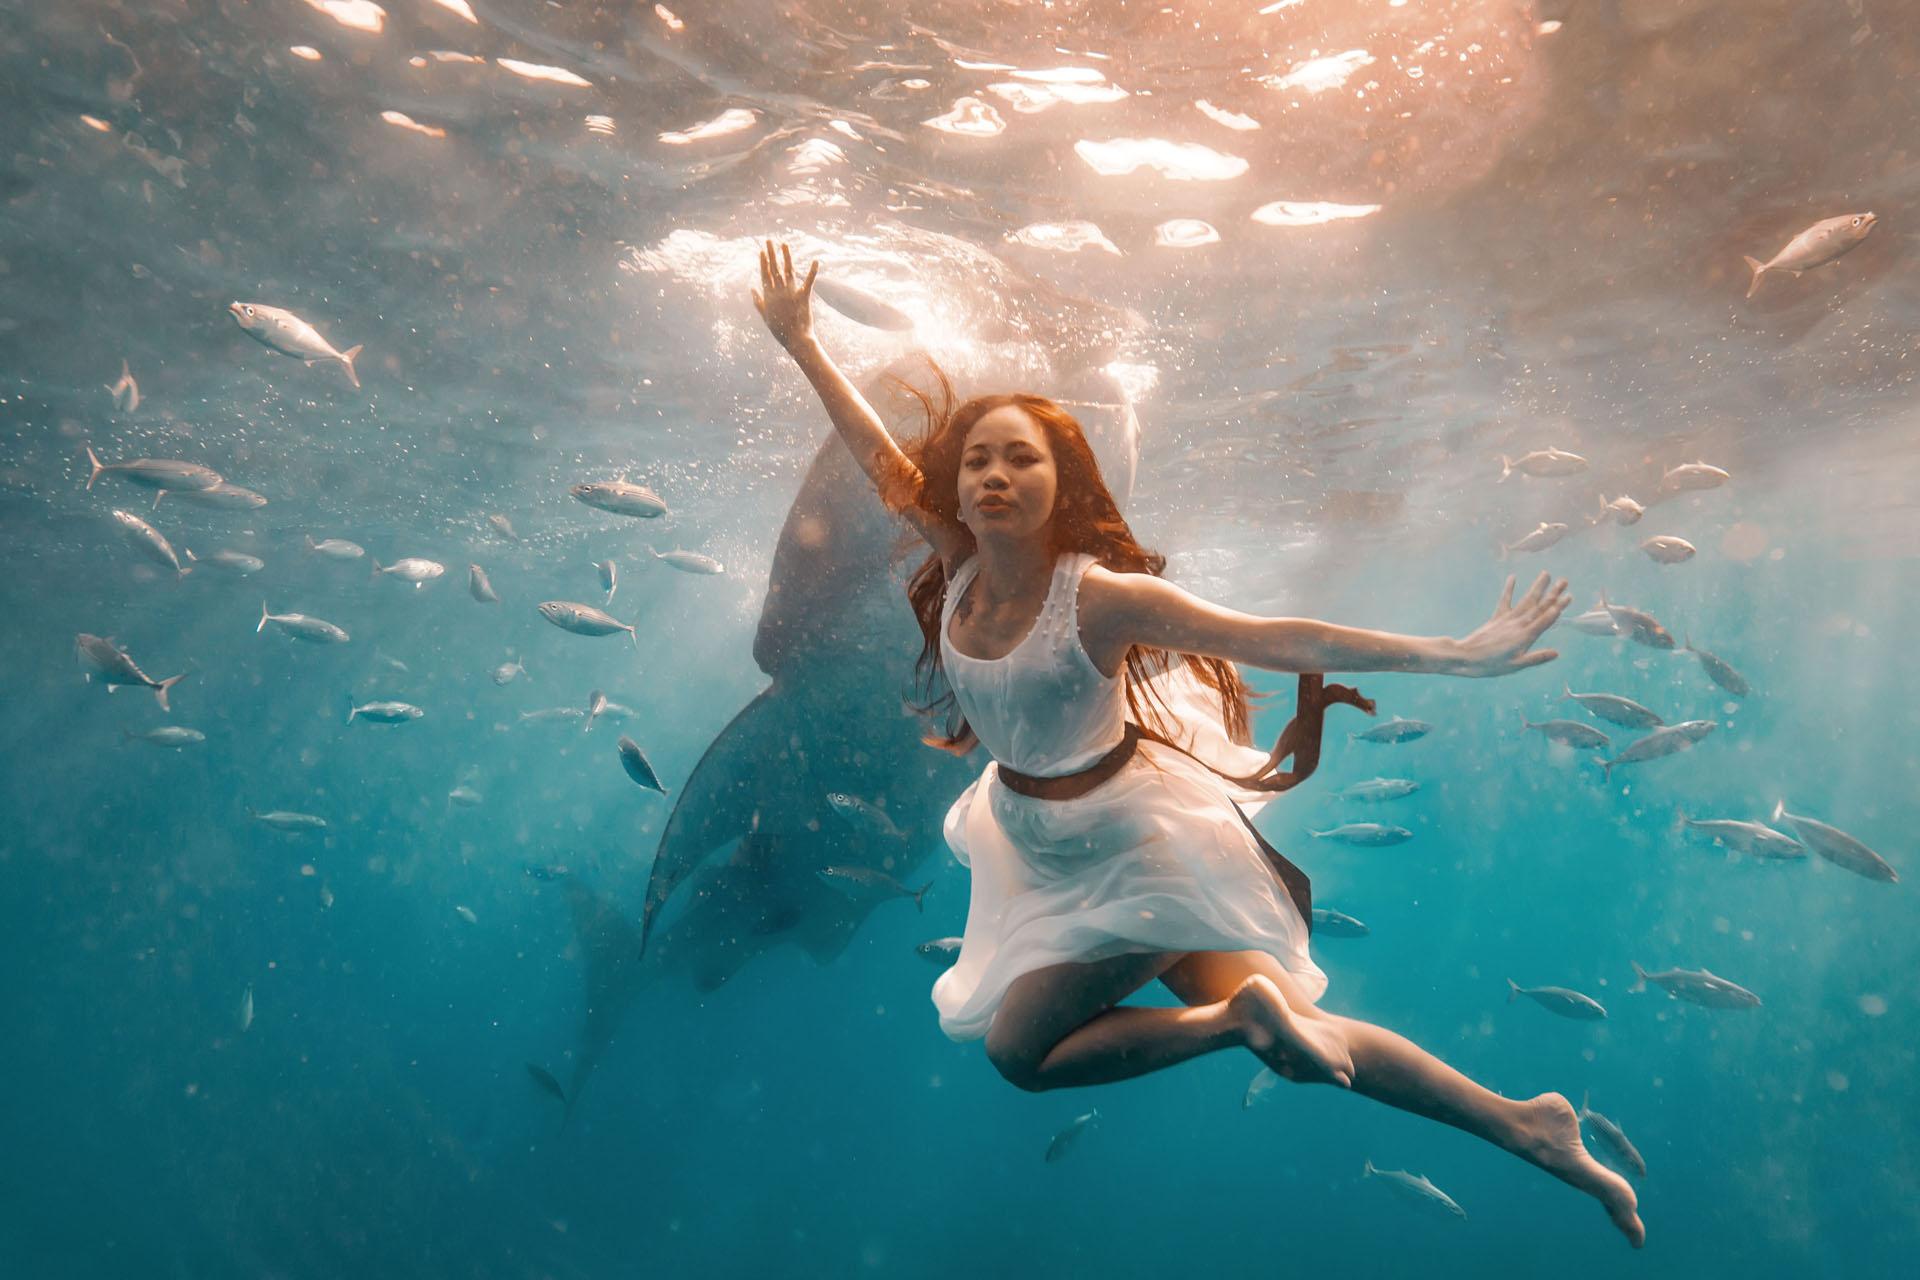 David moore australian photographer